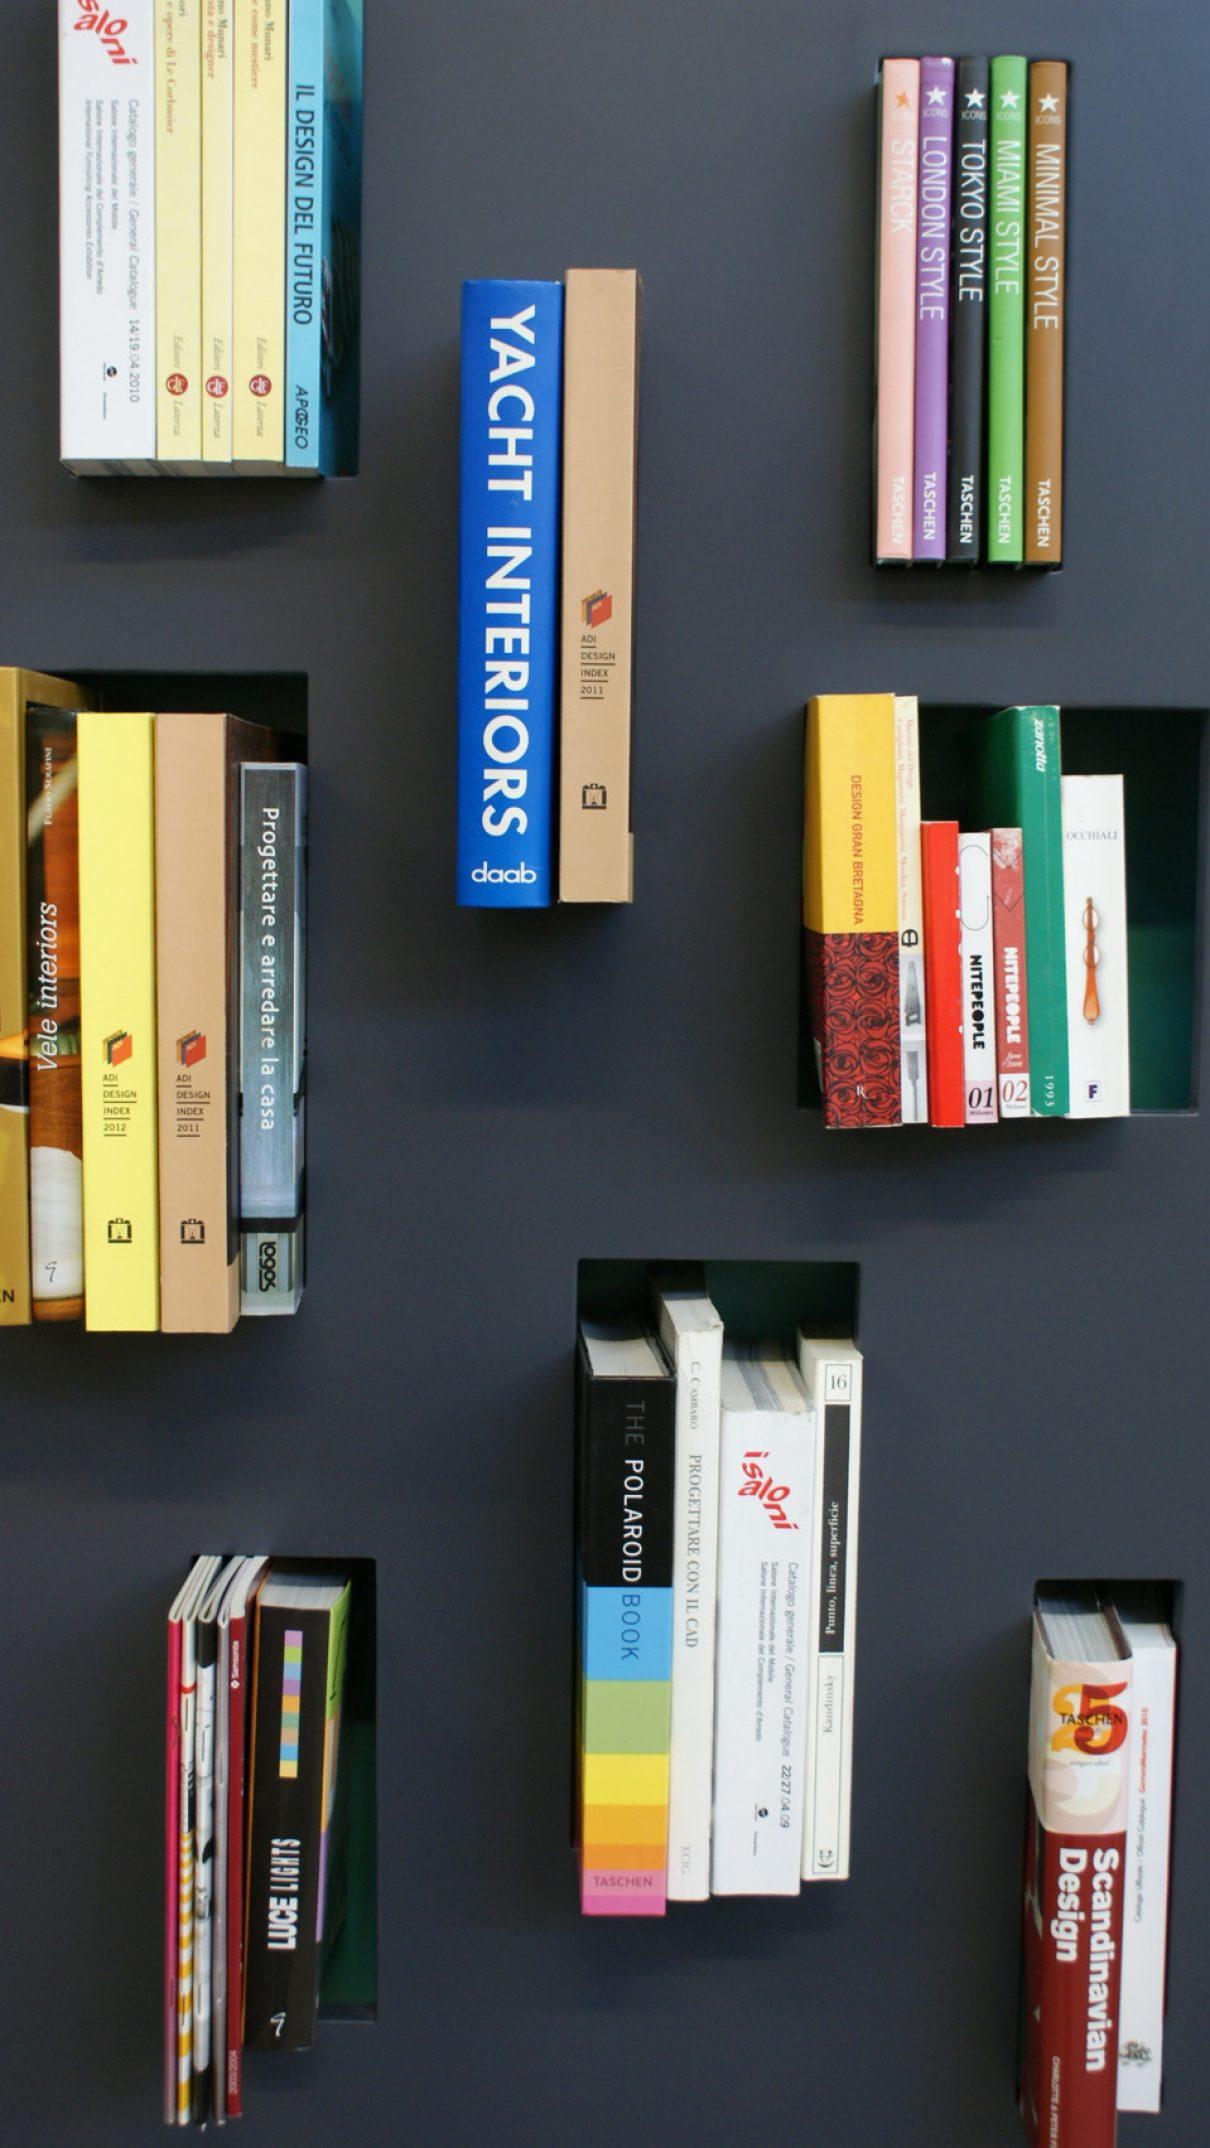 Modulaire boekenkast met vakjes i gimmii magazine - Modulaire muur ...